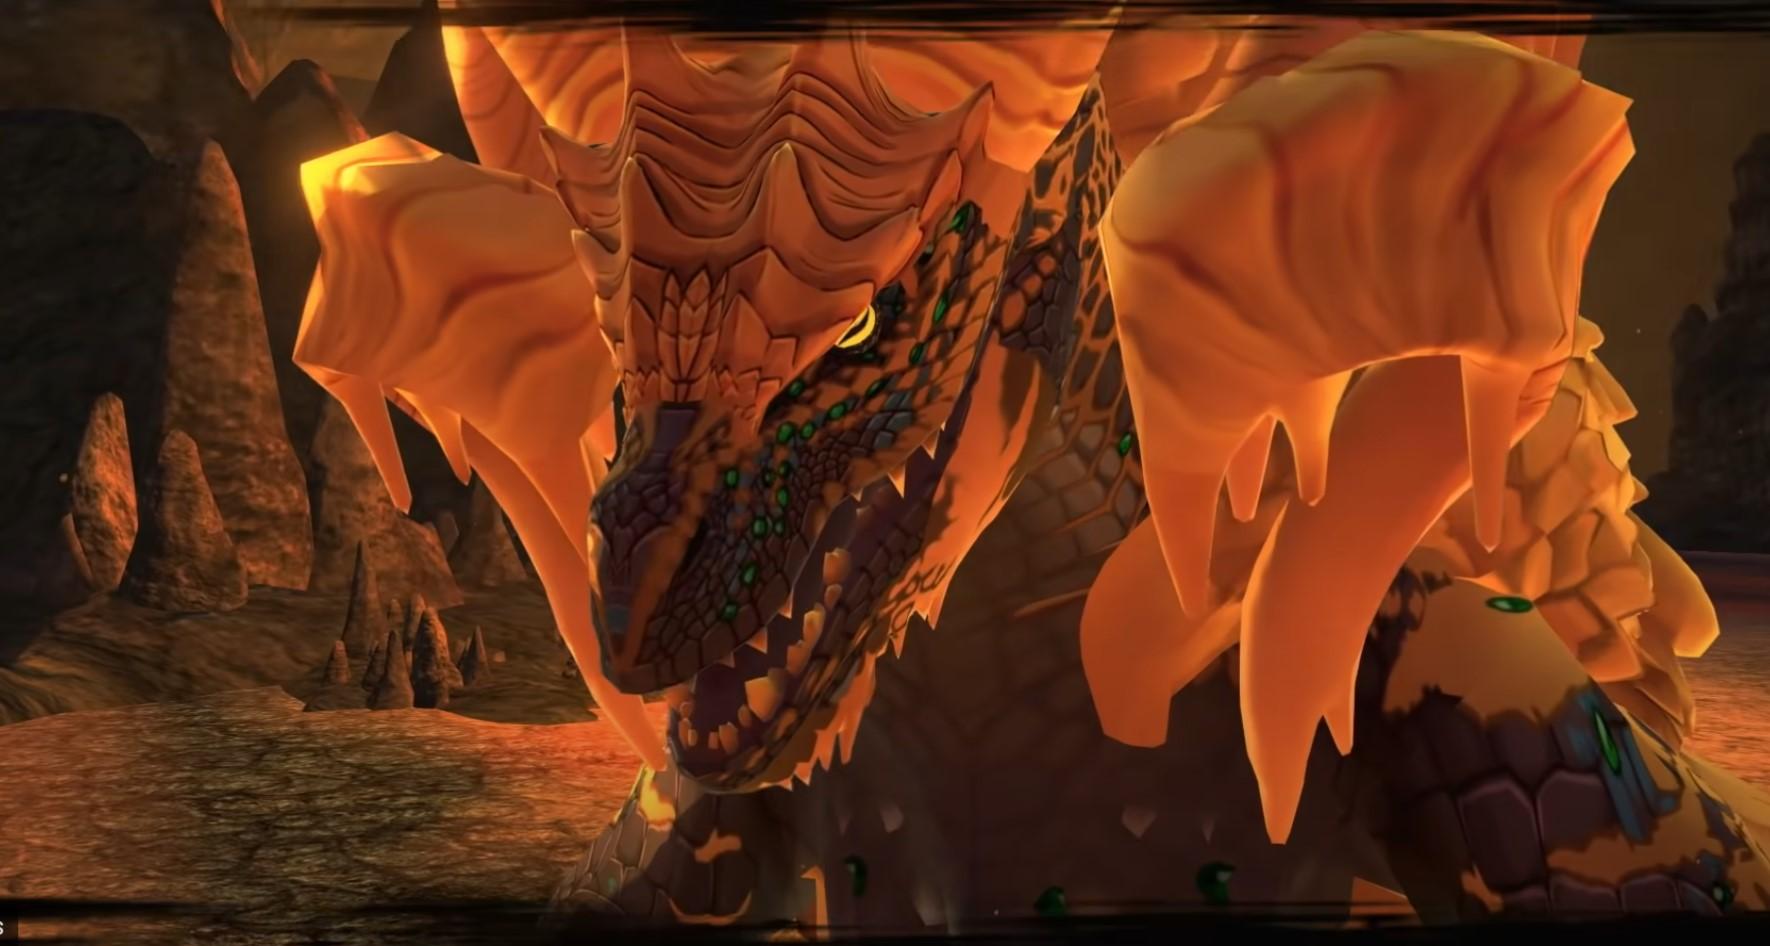 Monster Hunter Stories 2 version 1.4.0 update details revealed